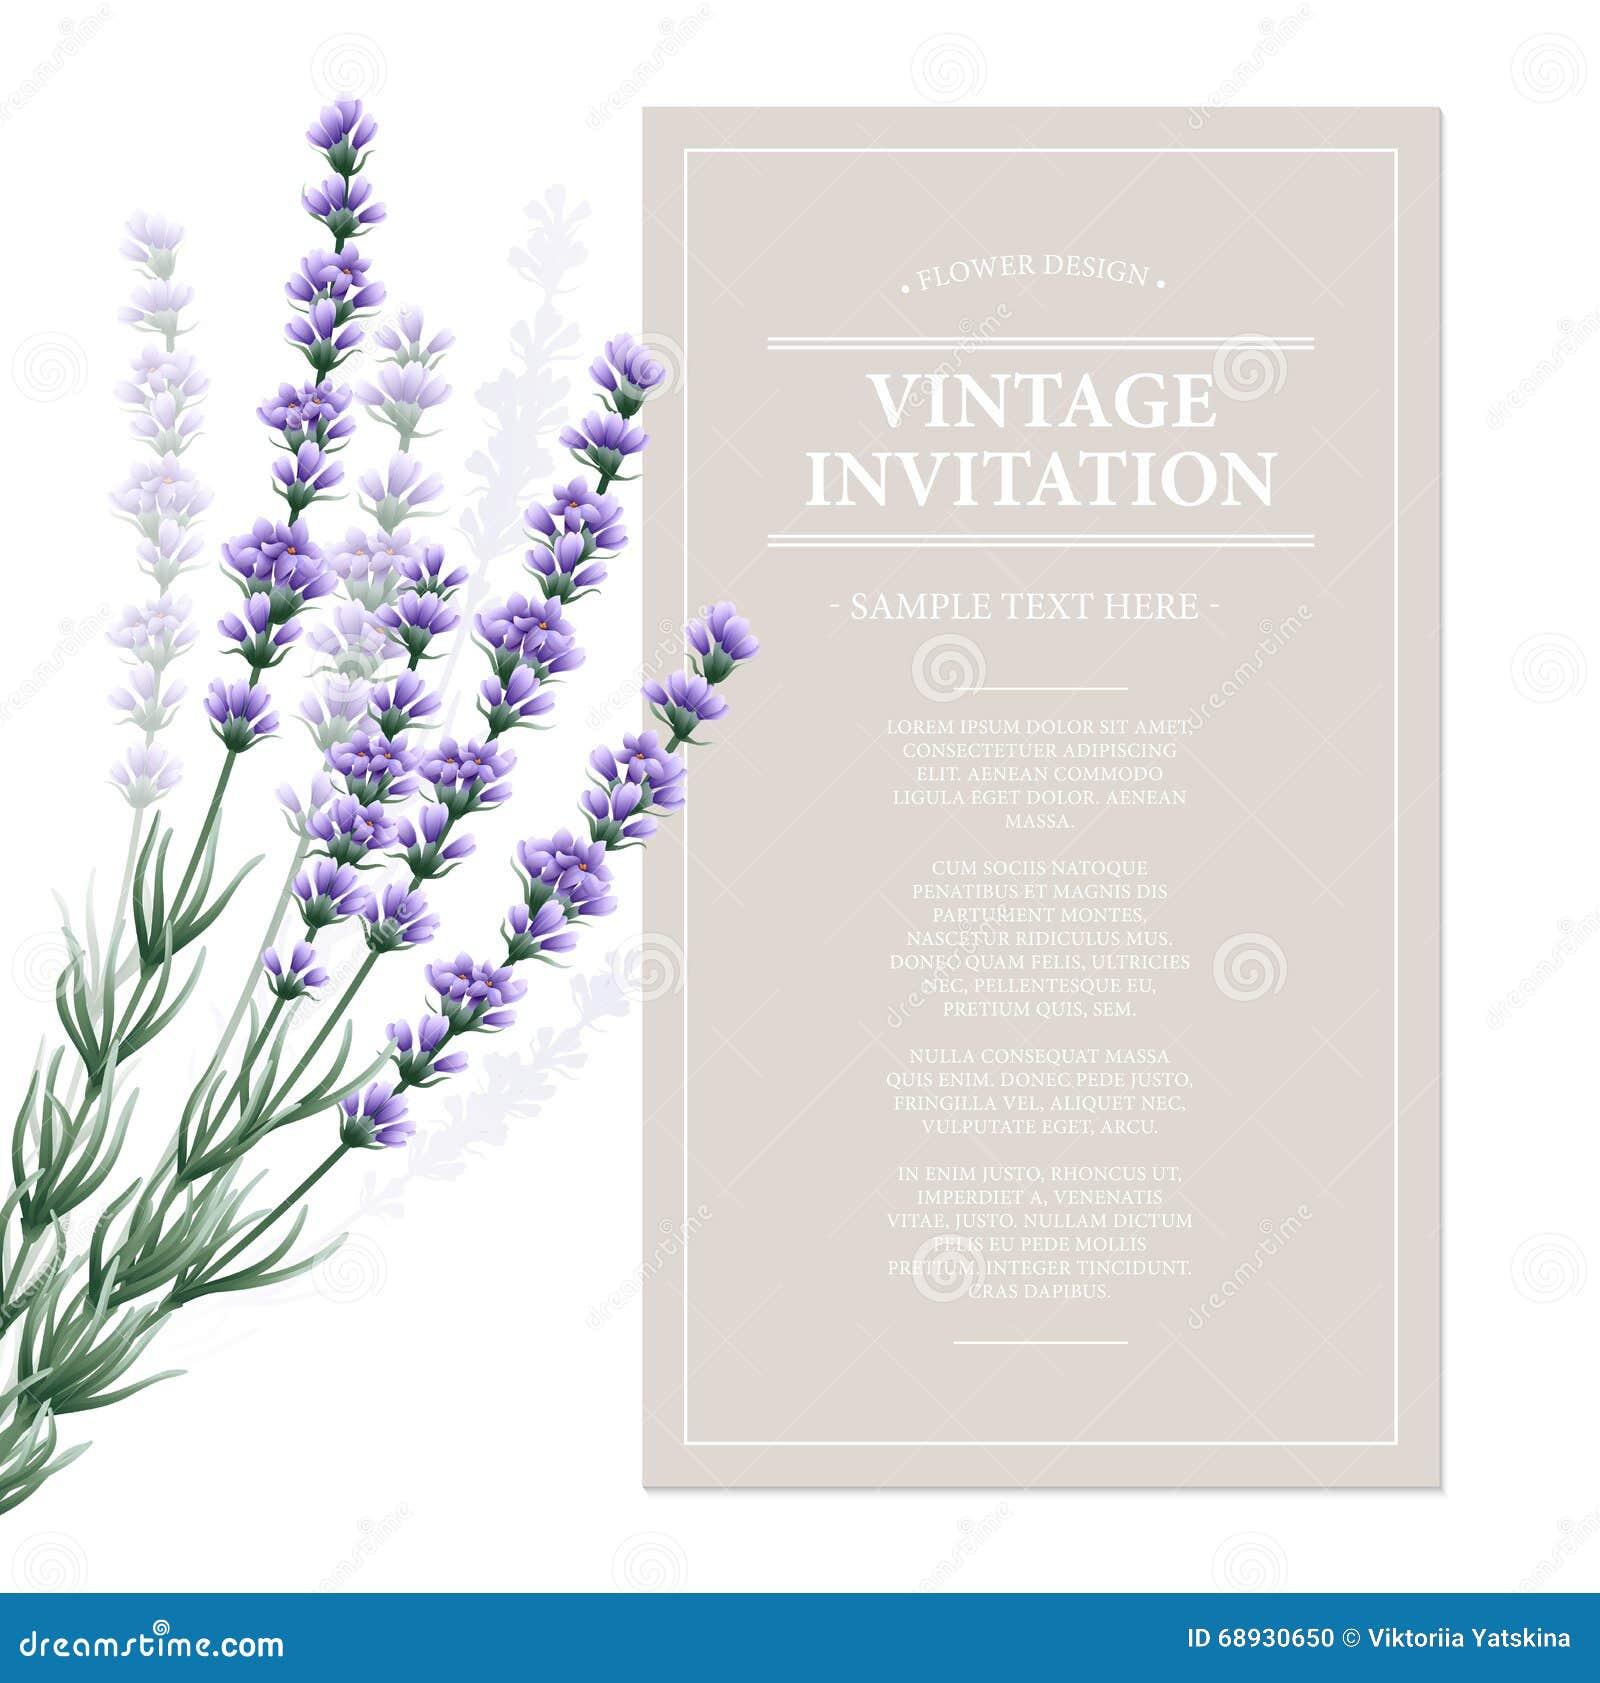 Vintage Stock Image - Lavender Plant - Botanical - The ...